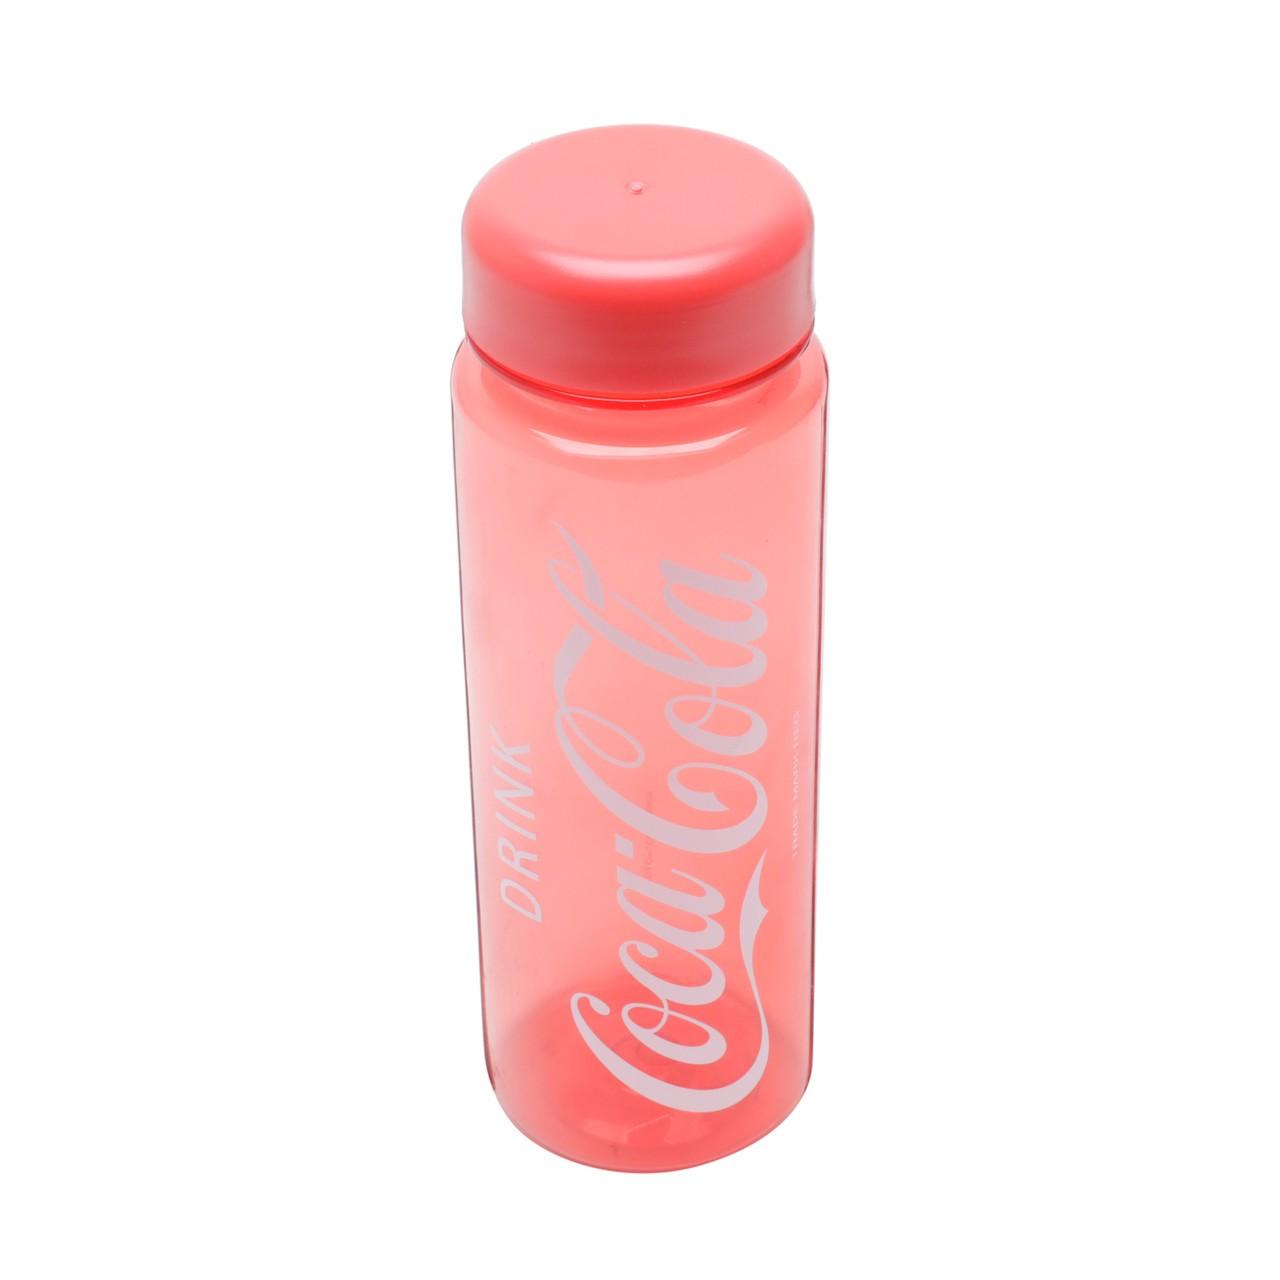 Garrada De Plástico Logo Clássico: Coca Cola 500ml - Urban